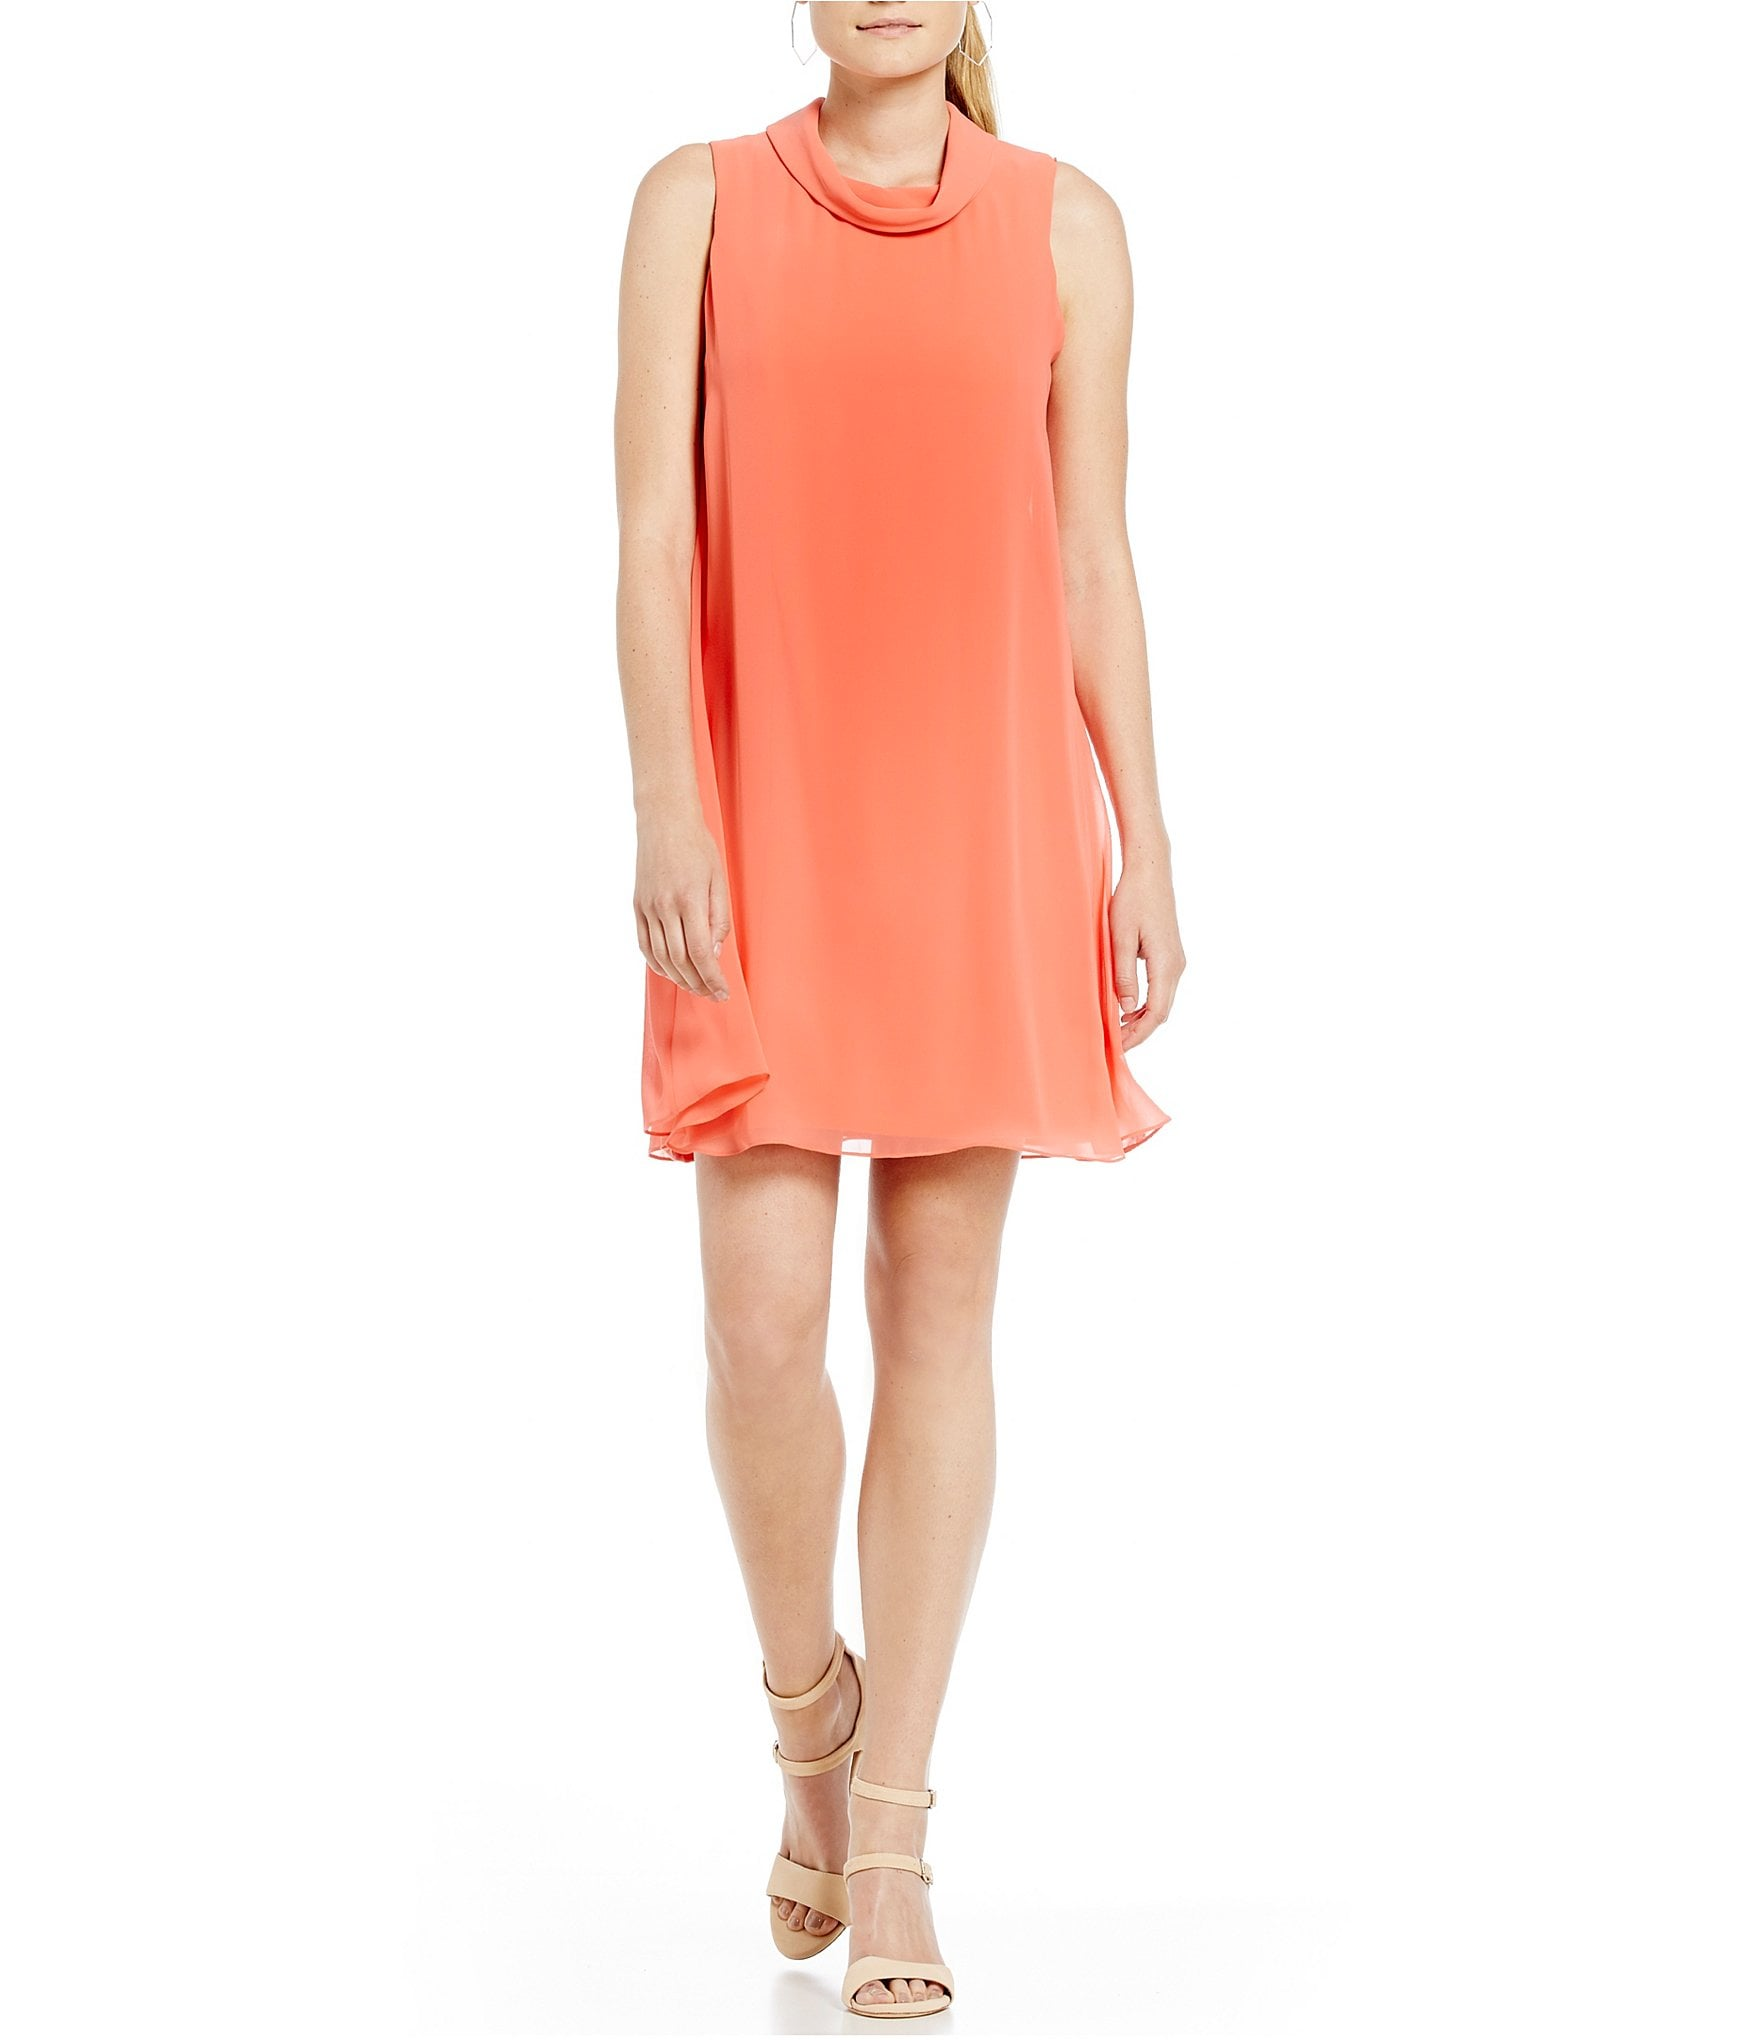 Sl sl fashion dresses - Sl Sl Fashion Dresses 24